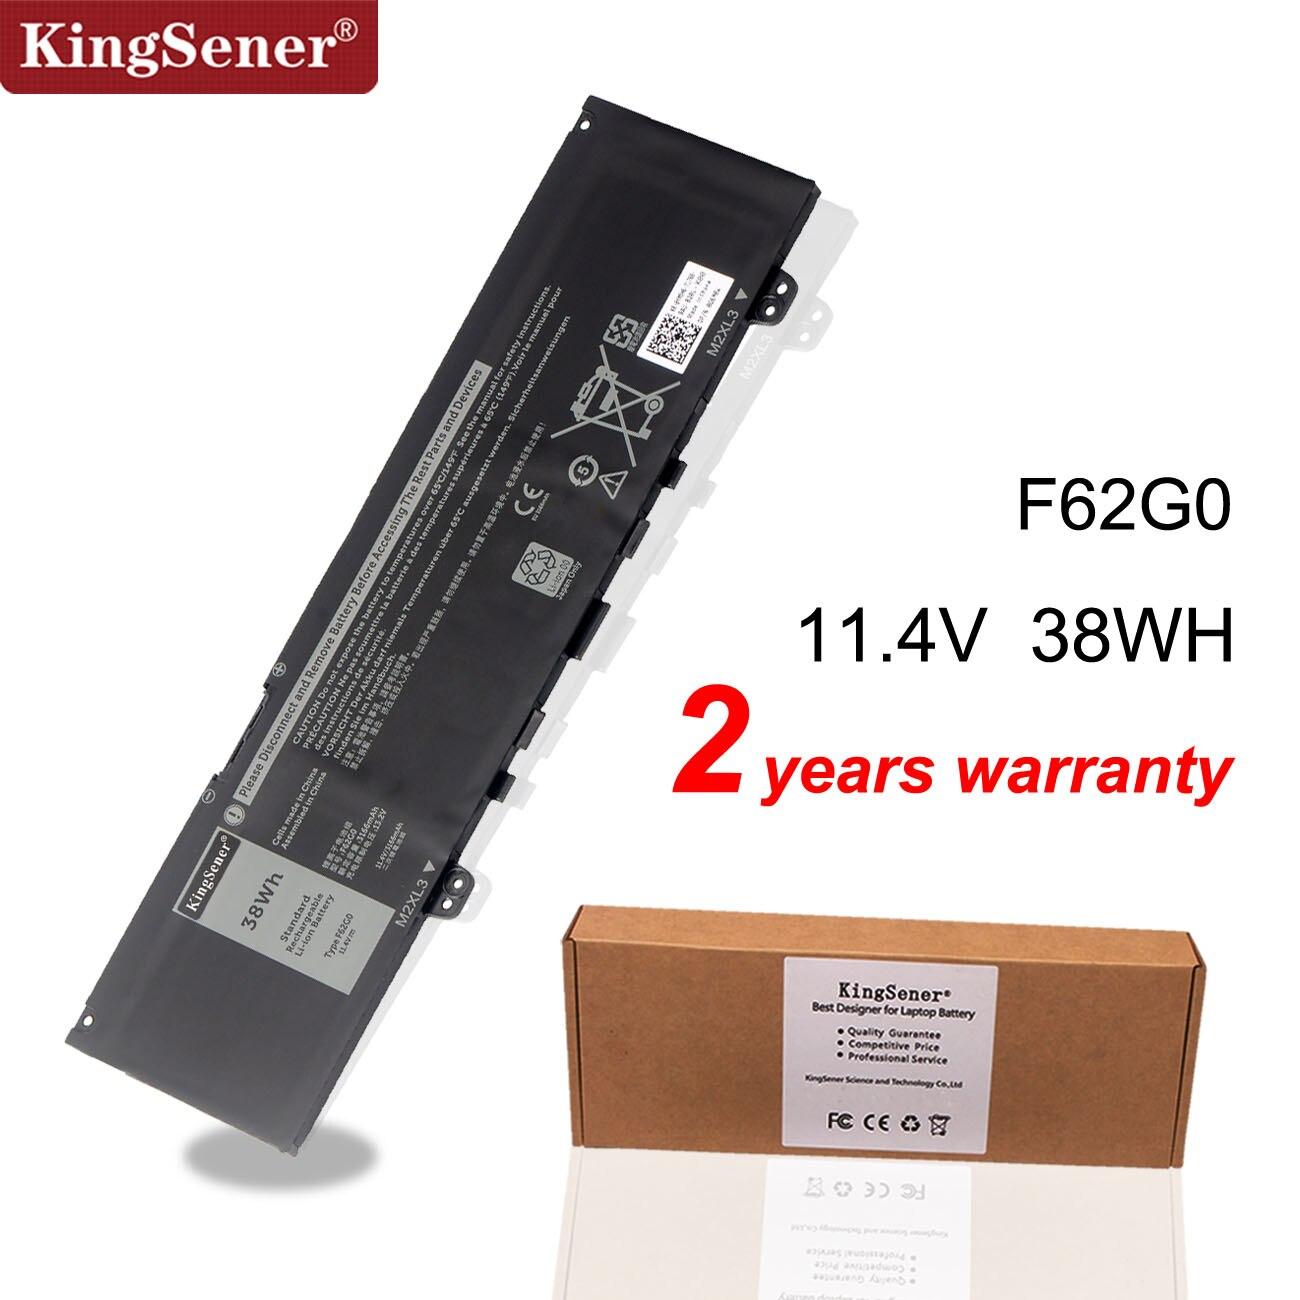 Kingsener 11.4V 38WH F62G0 Laptop Battery For DELL Inspiron 13 5370 7370 7373 7380 7386 Vostro 5370 RPJC3 39DY5